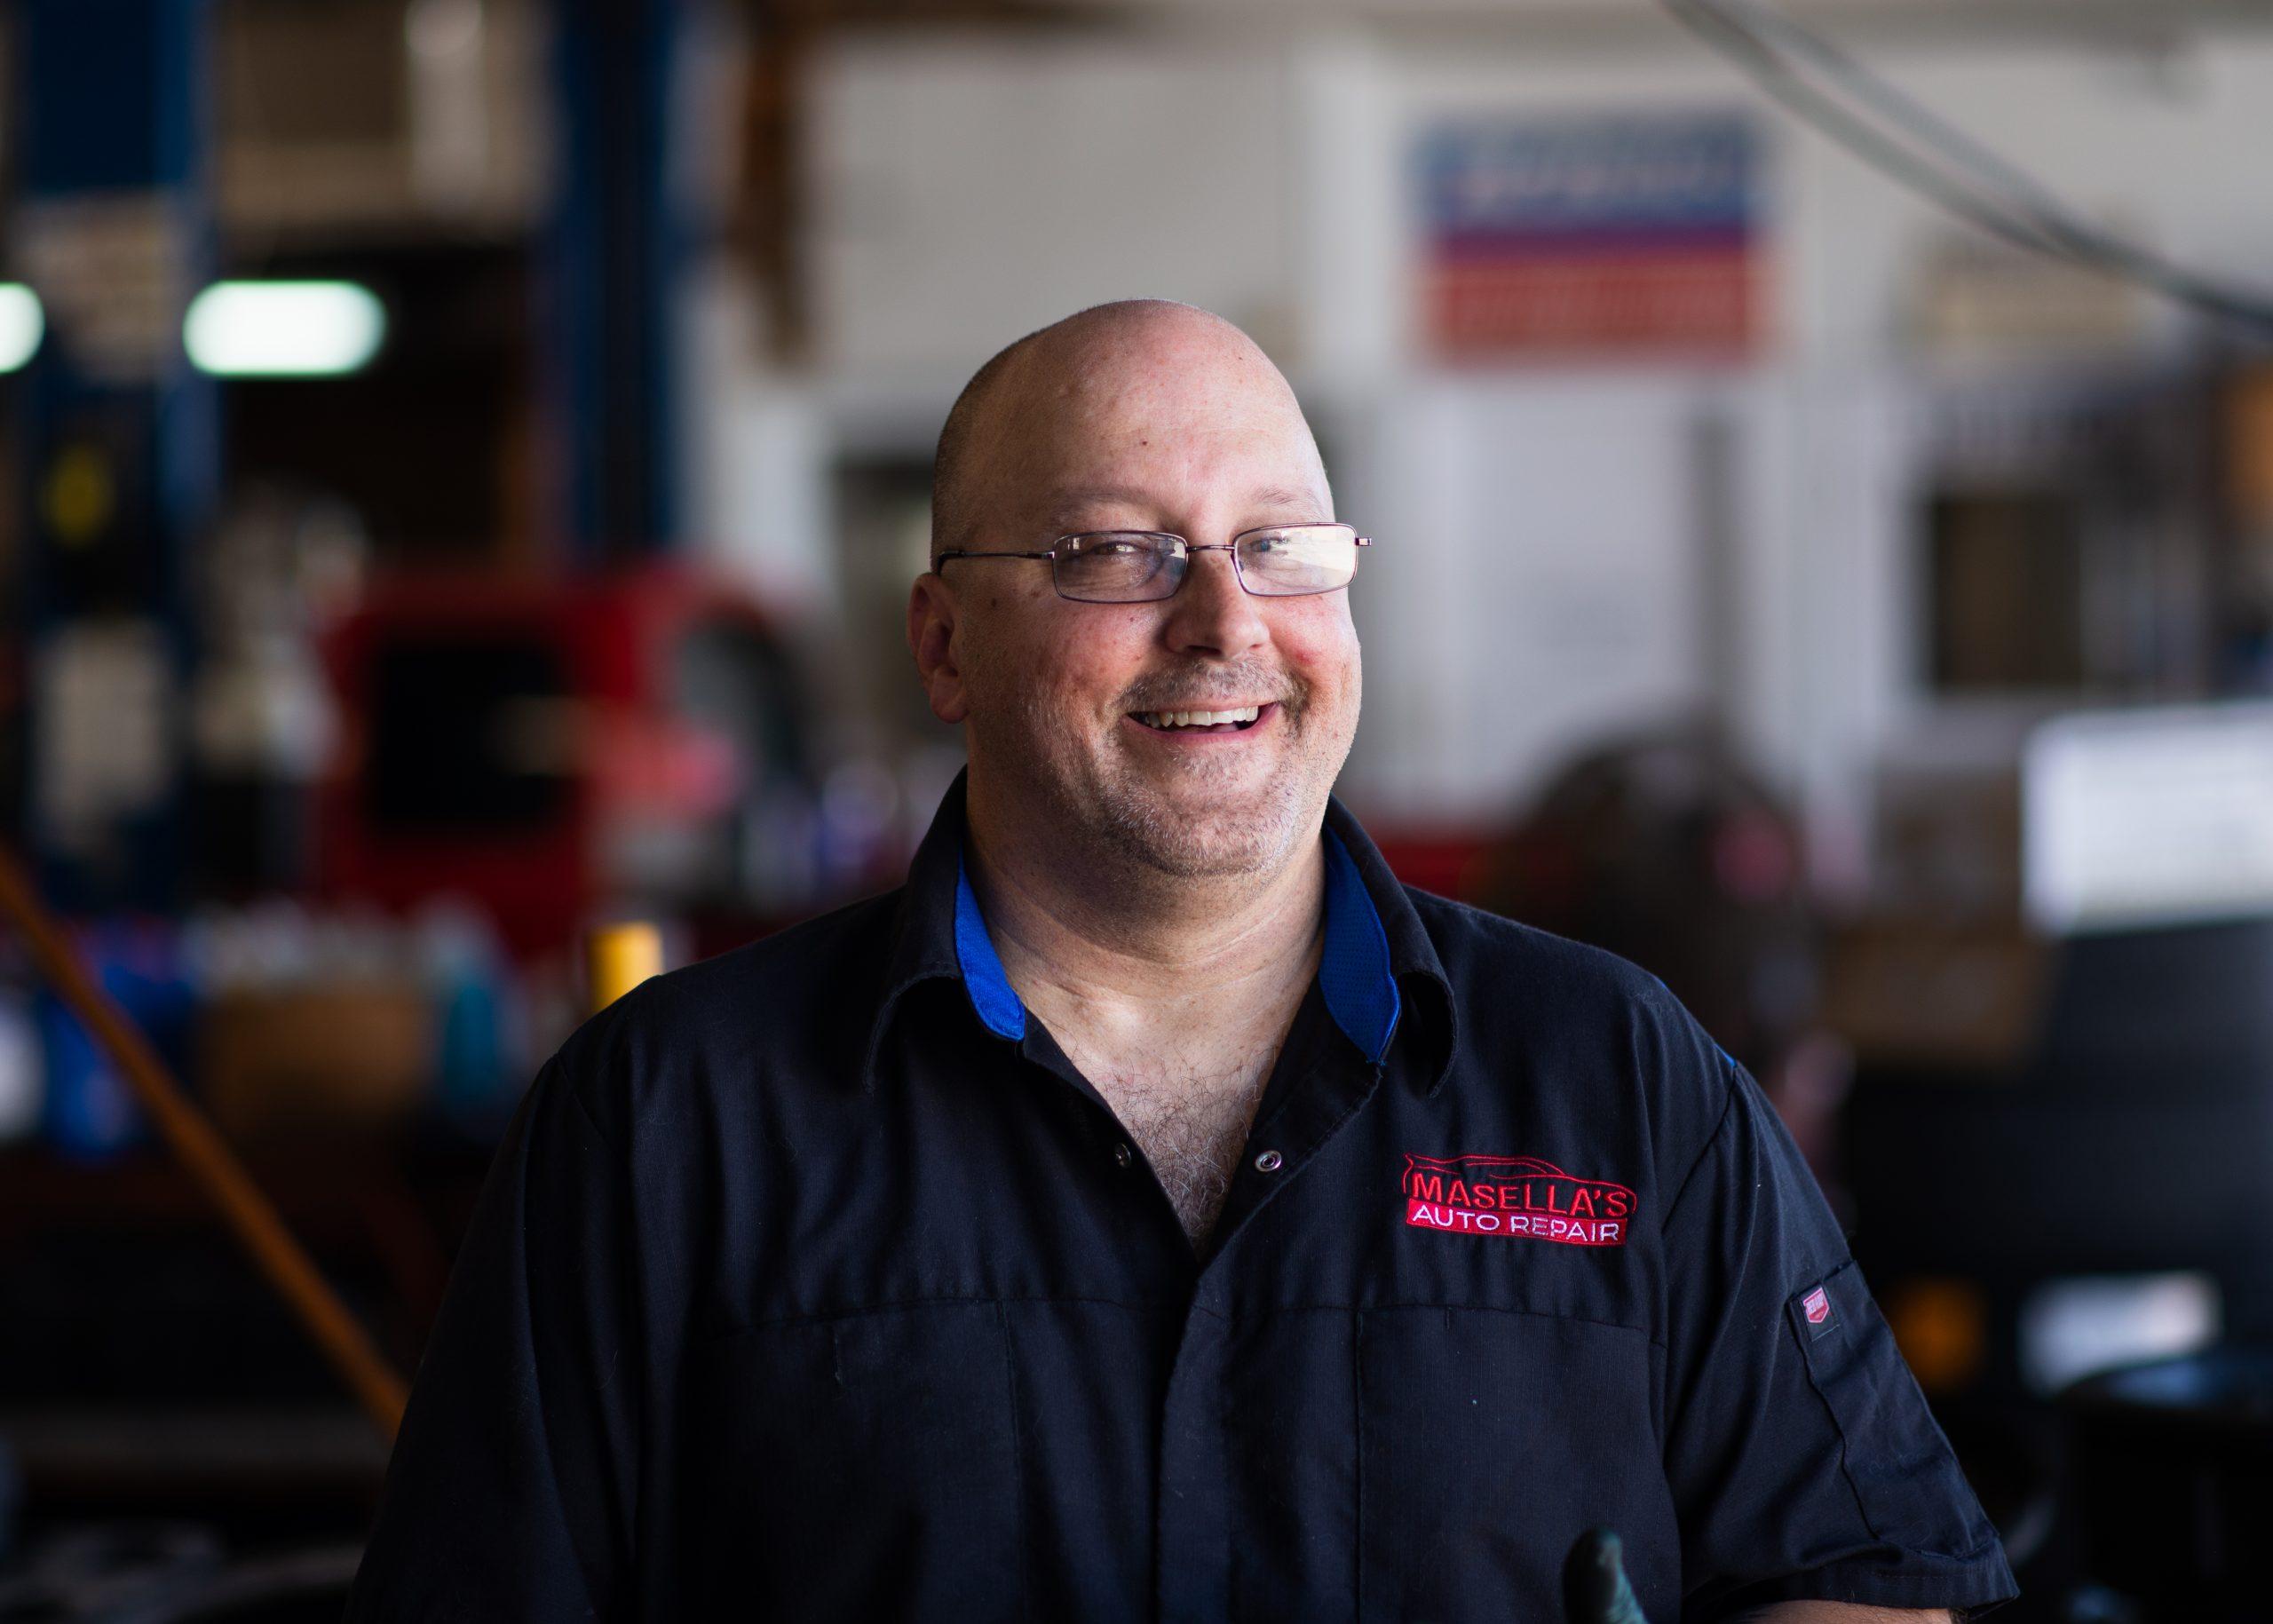 Venice FL automotive repair